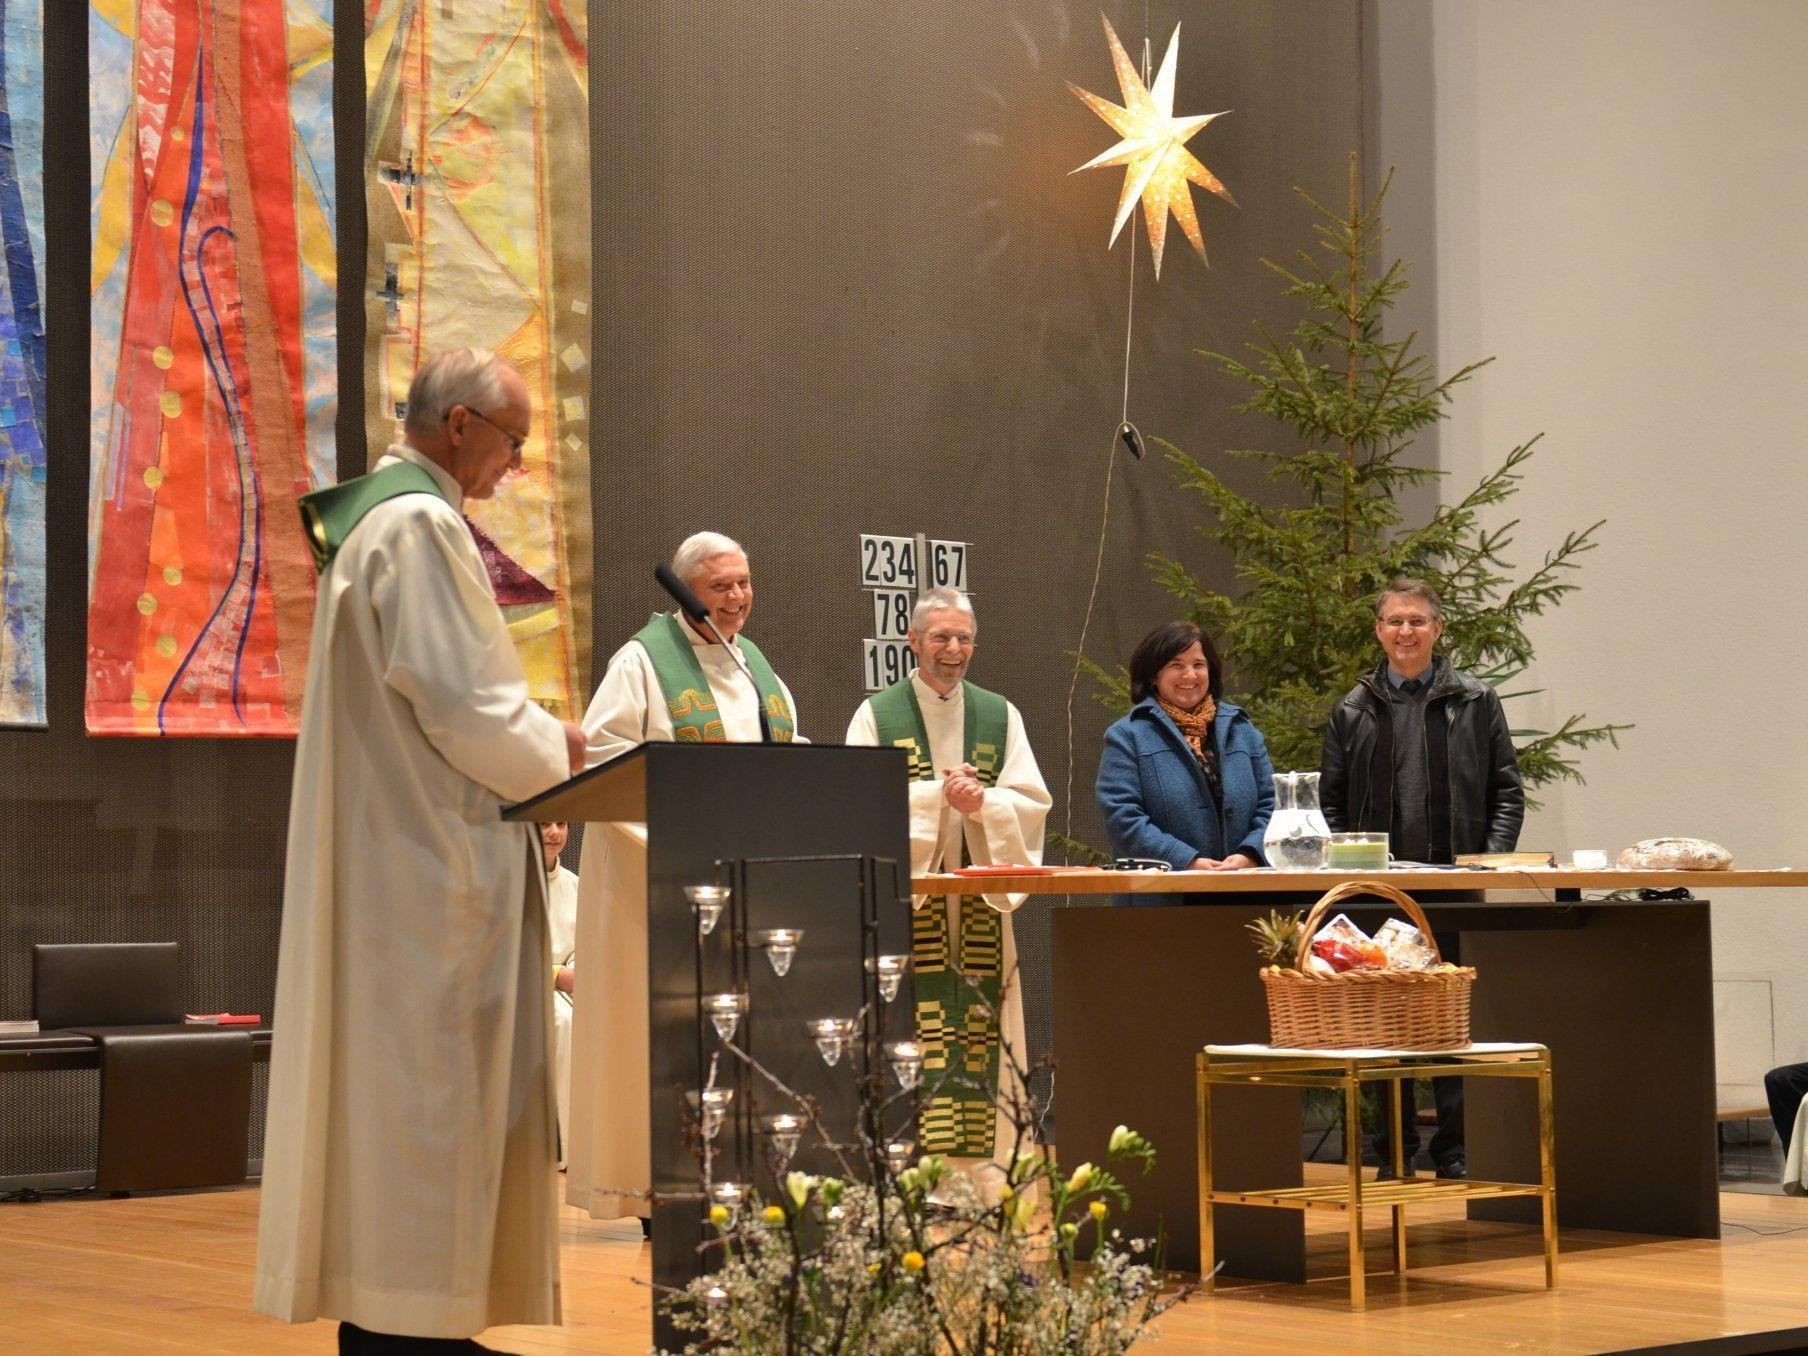 (v.li.) Pfarreinführung dr. Dekan Spieler m. Vikar Biondi, Pfarrer Witwer, Ulrich-Neubauer u.Gassner